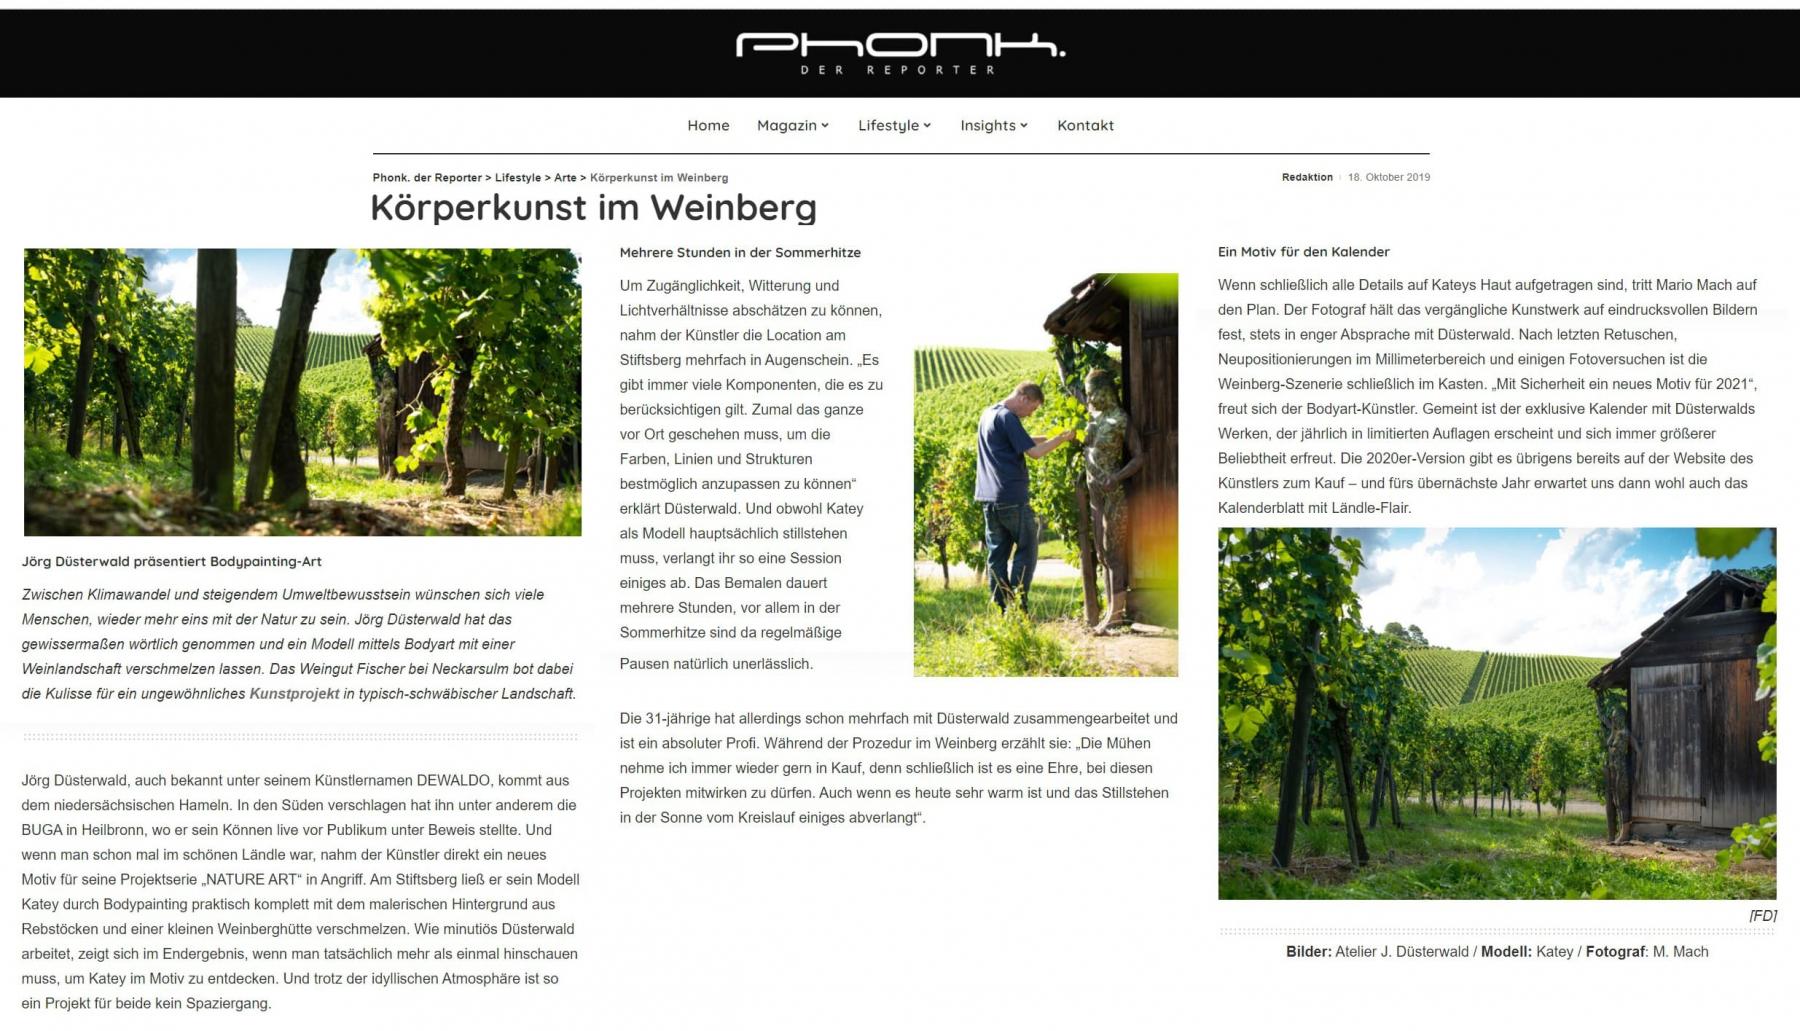 Medienbericht Bodypainting-Künstler Jörg Düsterwald (Magazin: PHONK / Okt.2019)